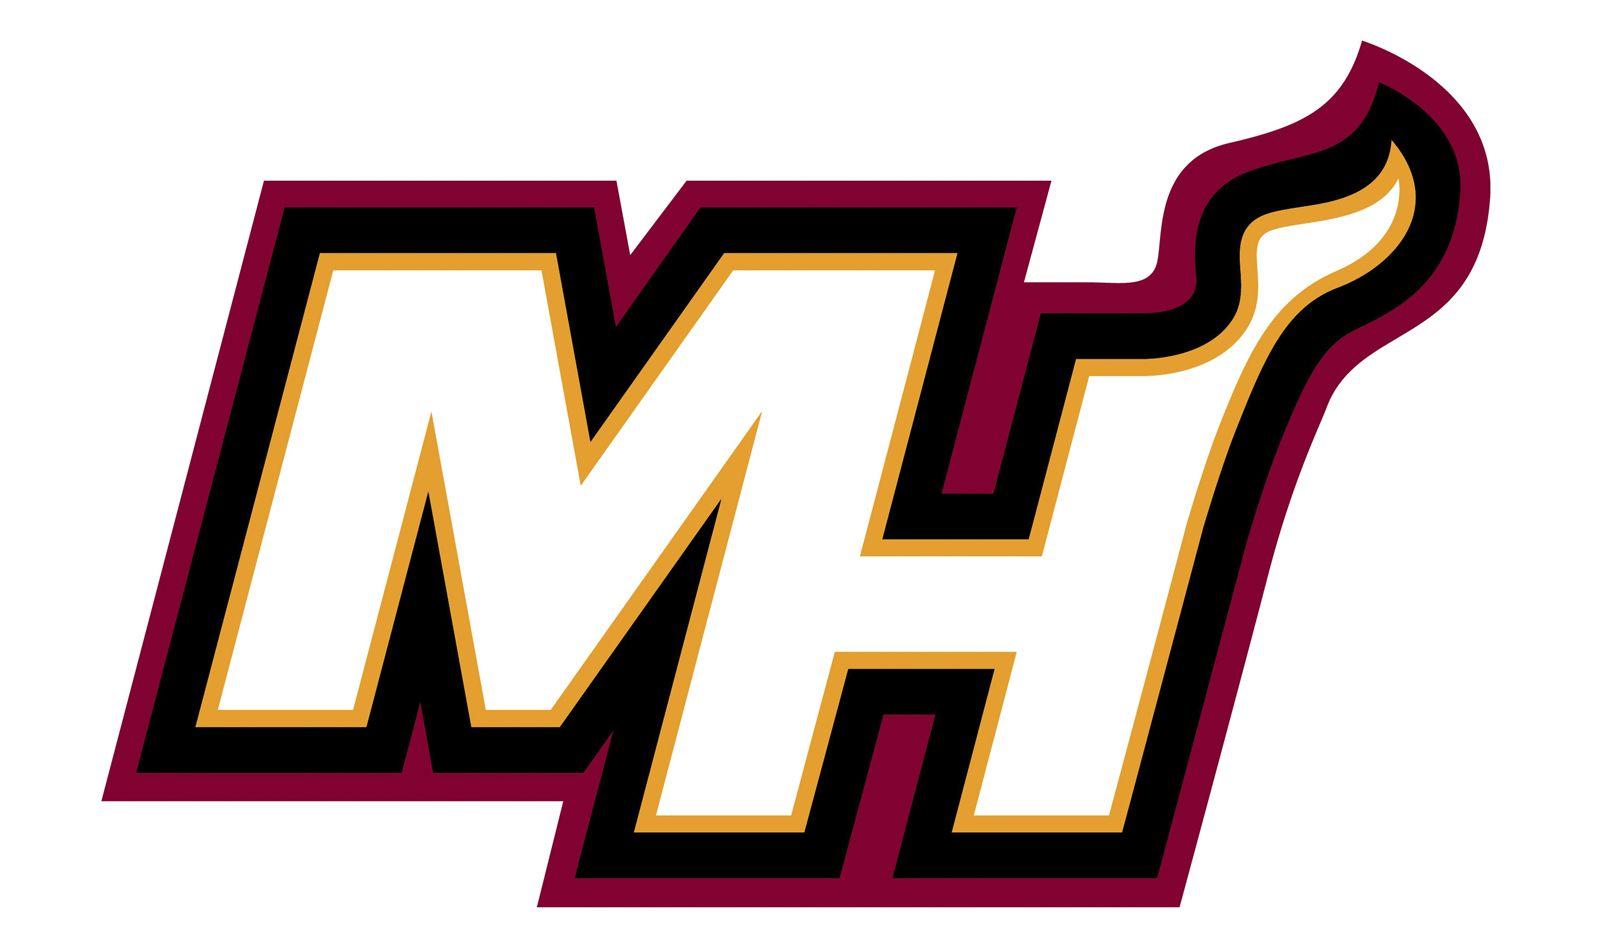 miami heat logo miami heat symbol meaning history and evolution